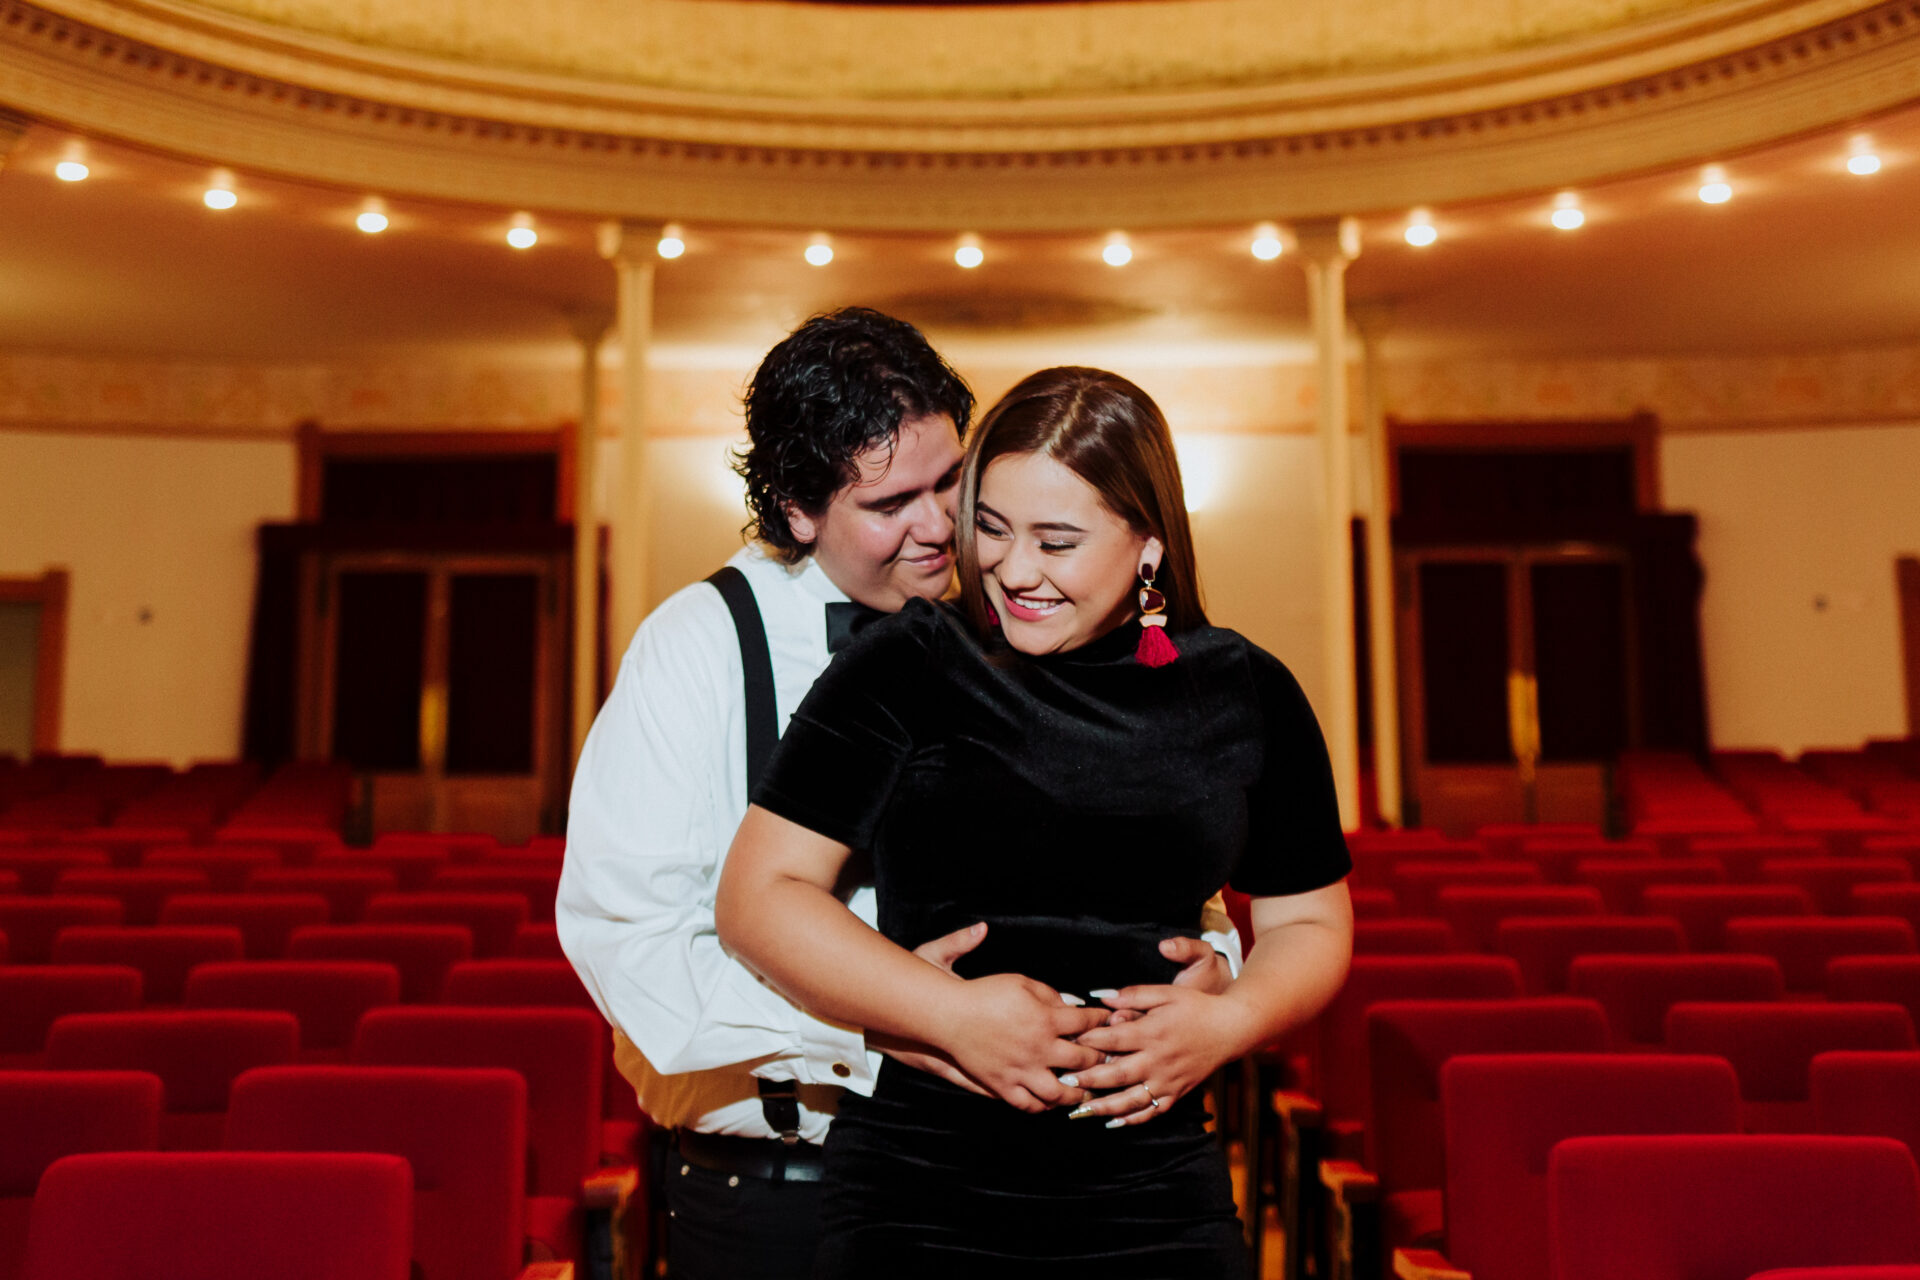 javier_noriega_fotografo_save_the_date_zacatecas_wedding_photographer4